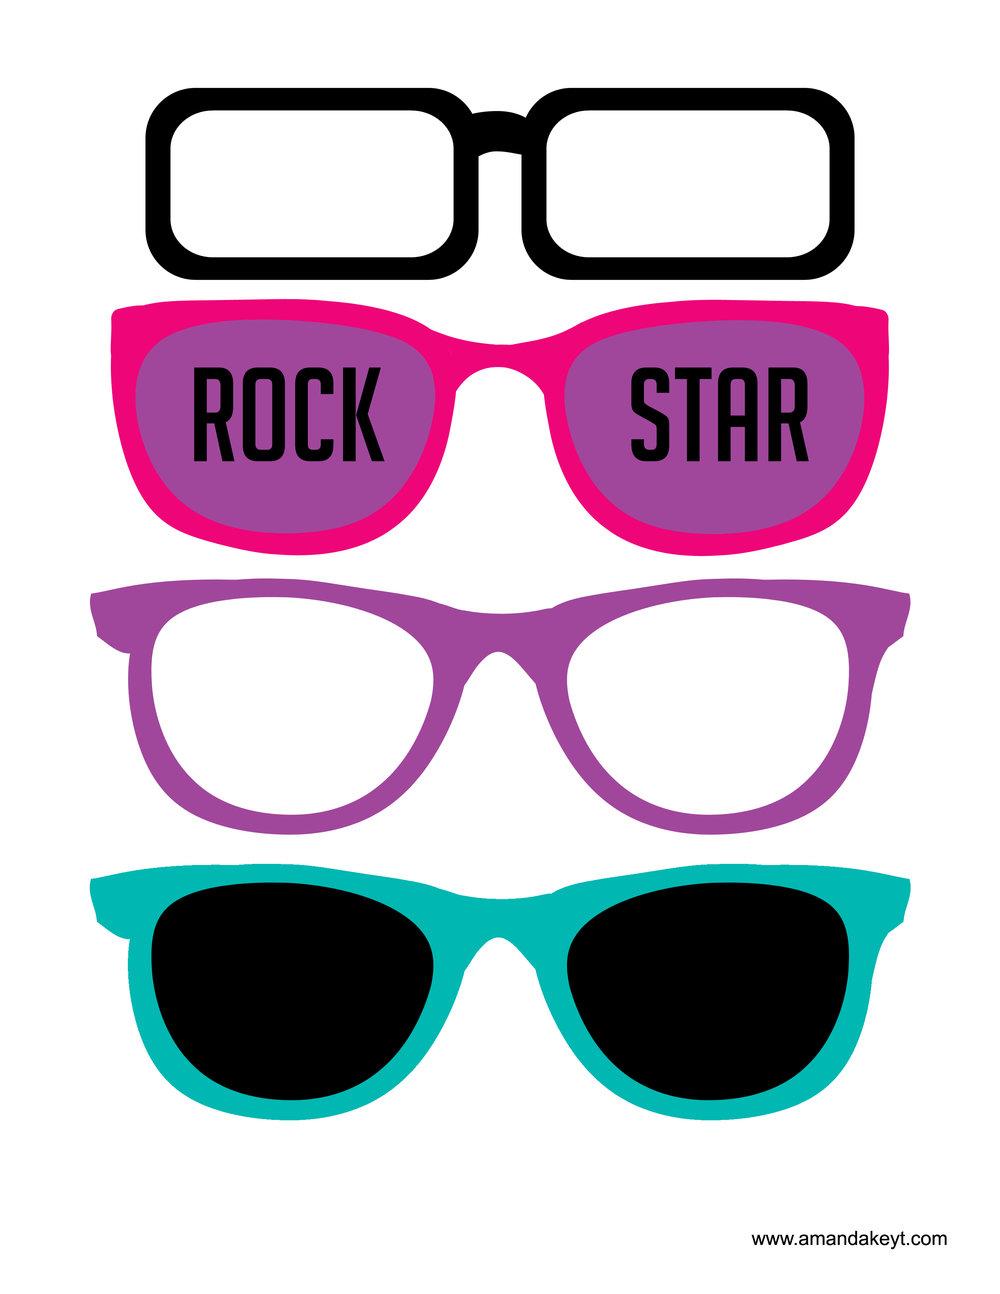 Teal Pink Rock Star